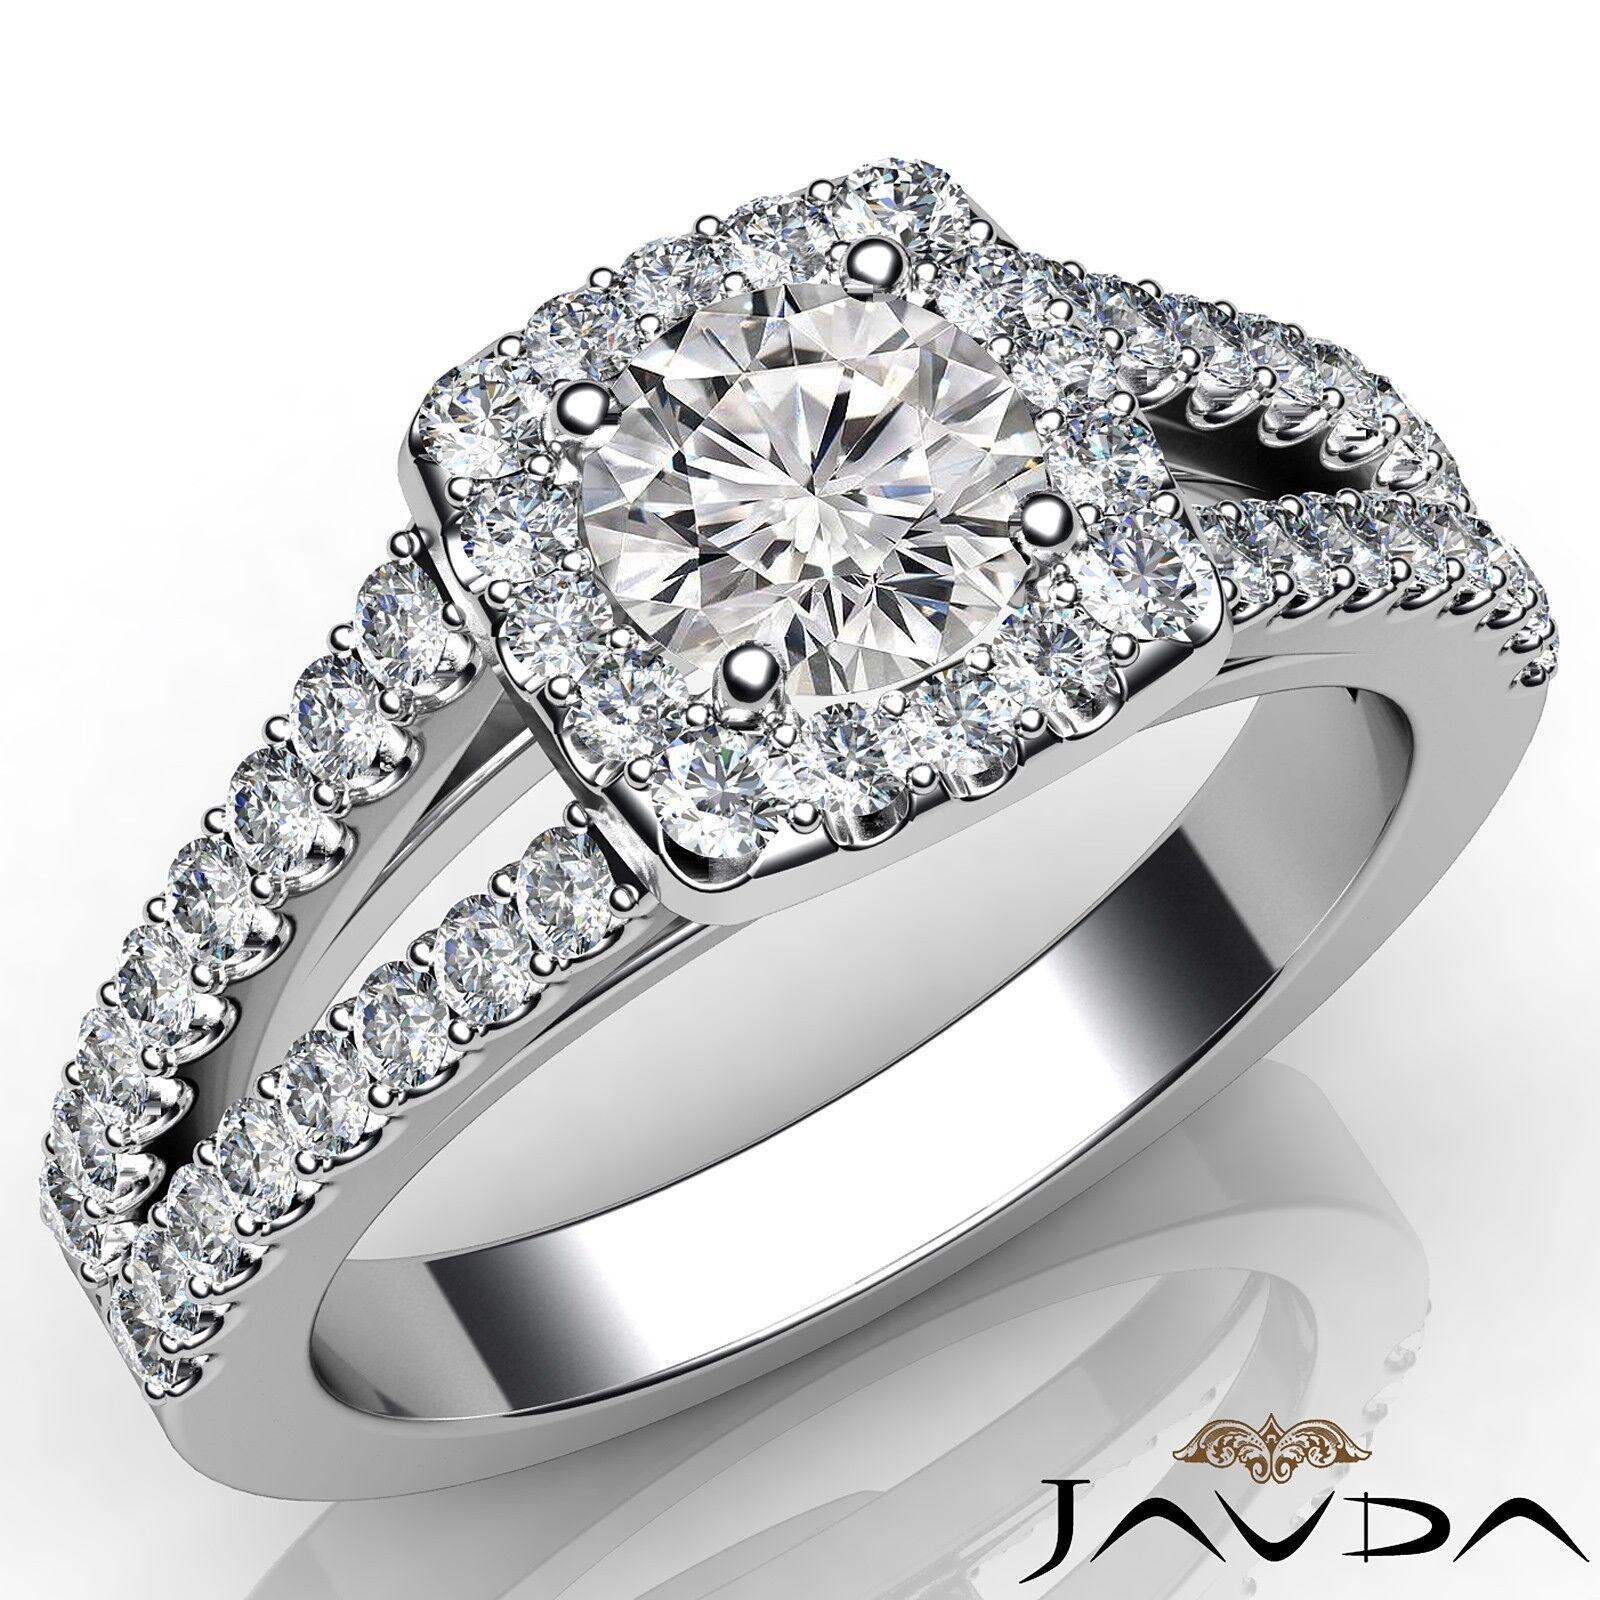 1.45ctw Halo Pave Set Round Diamond Engagement Ring GIA H-VS2 White Gold Rings